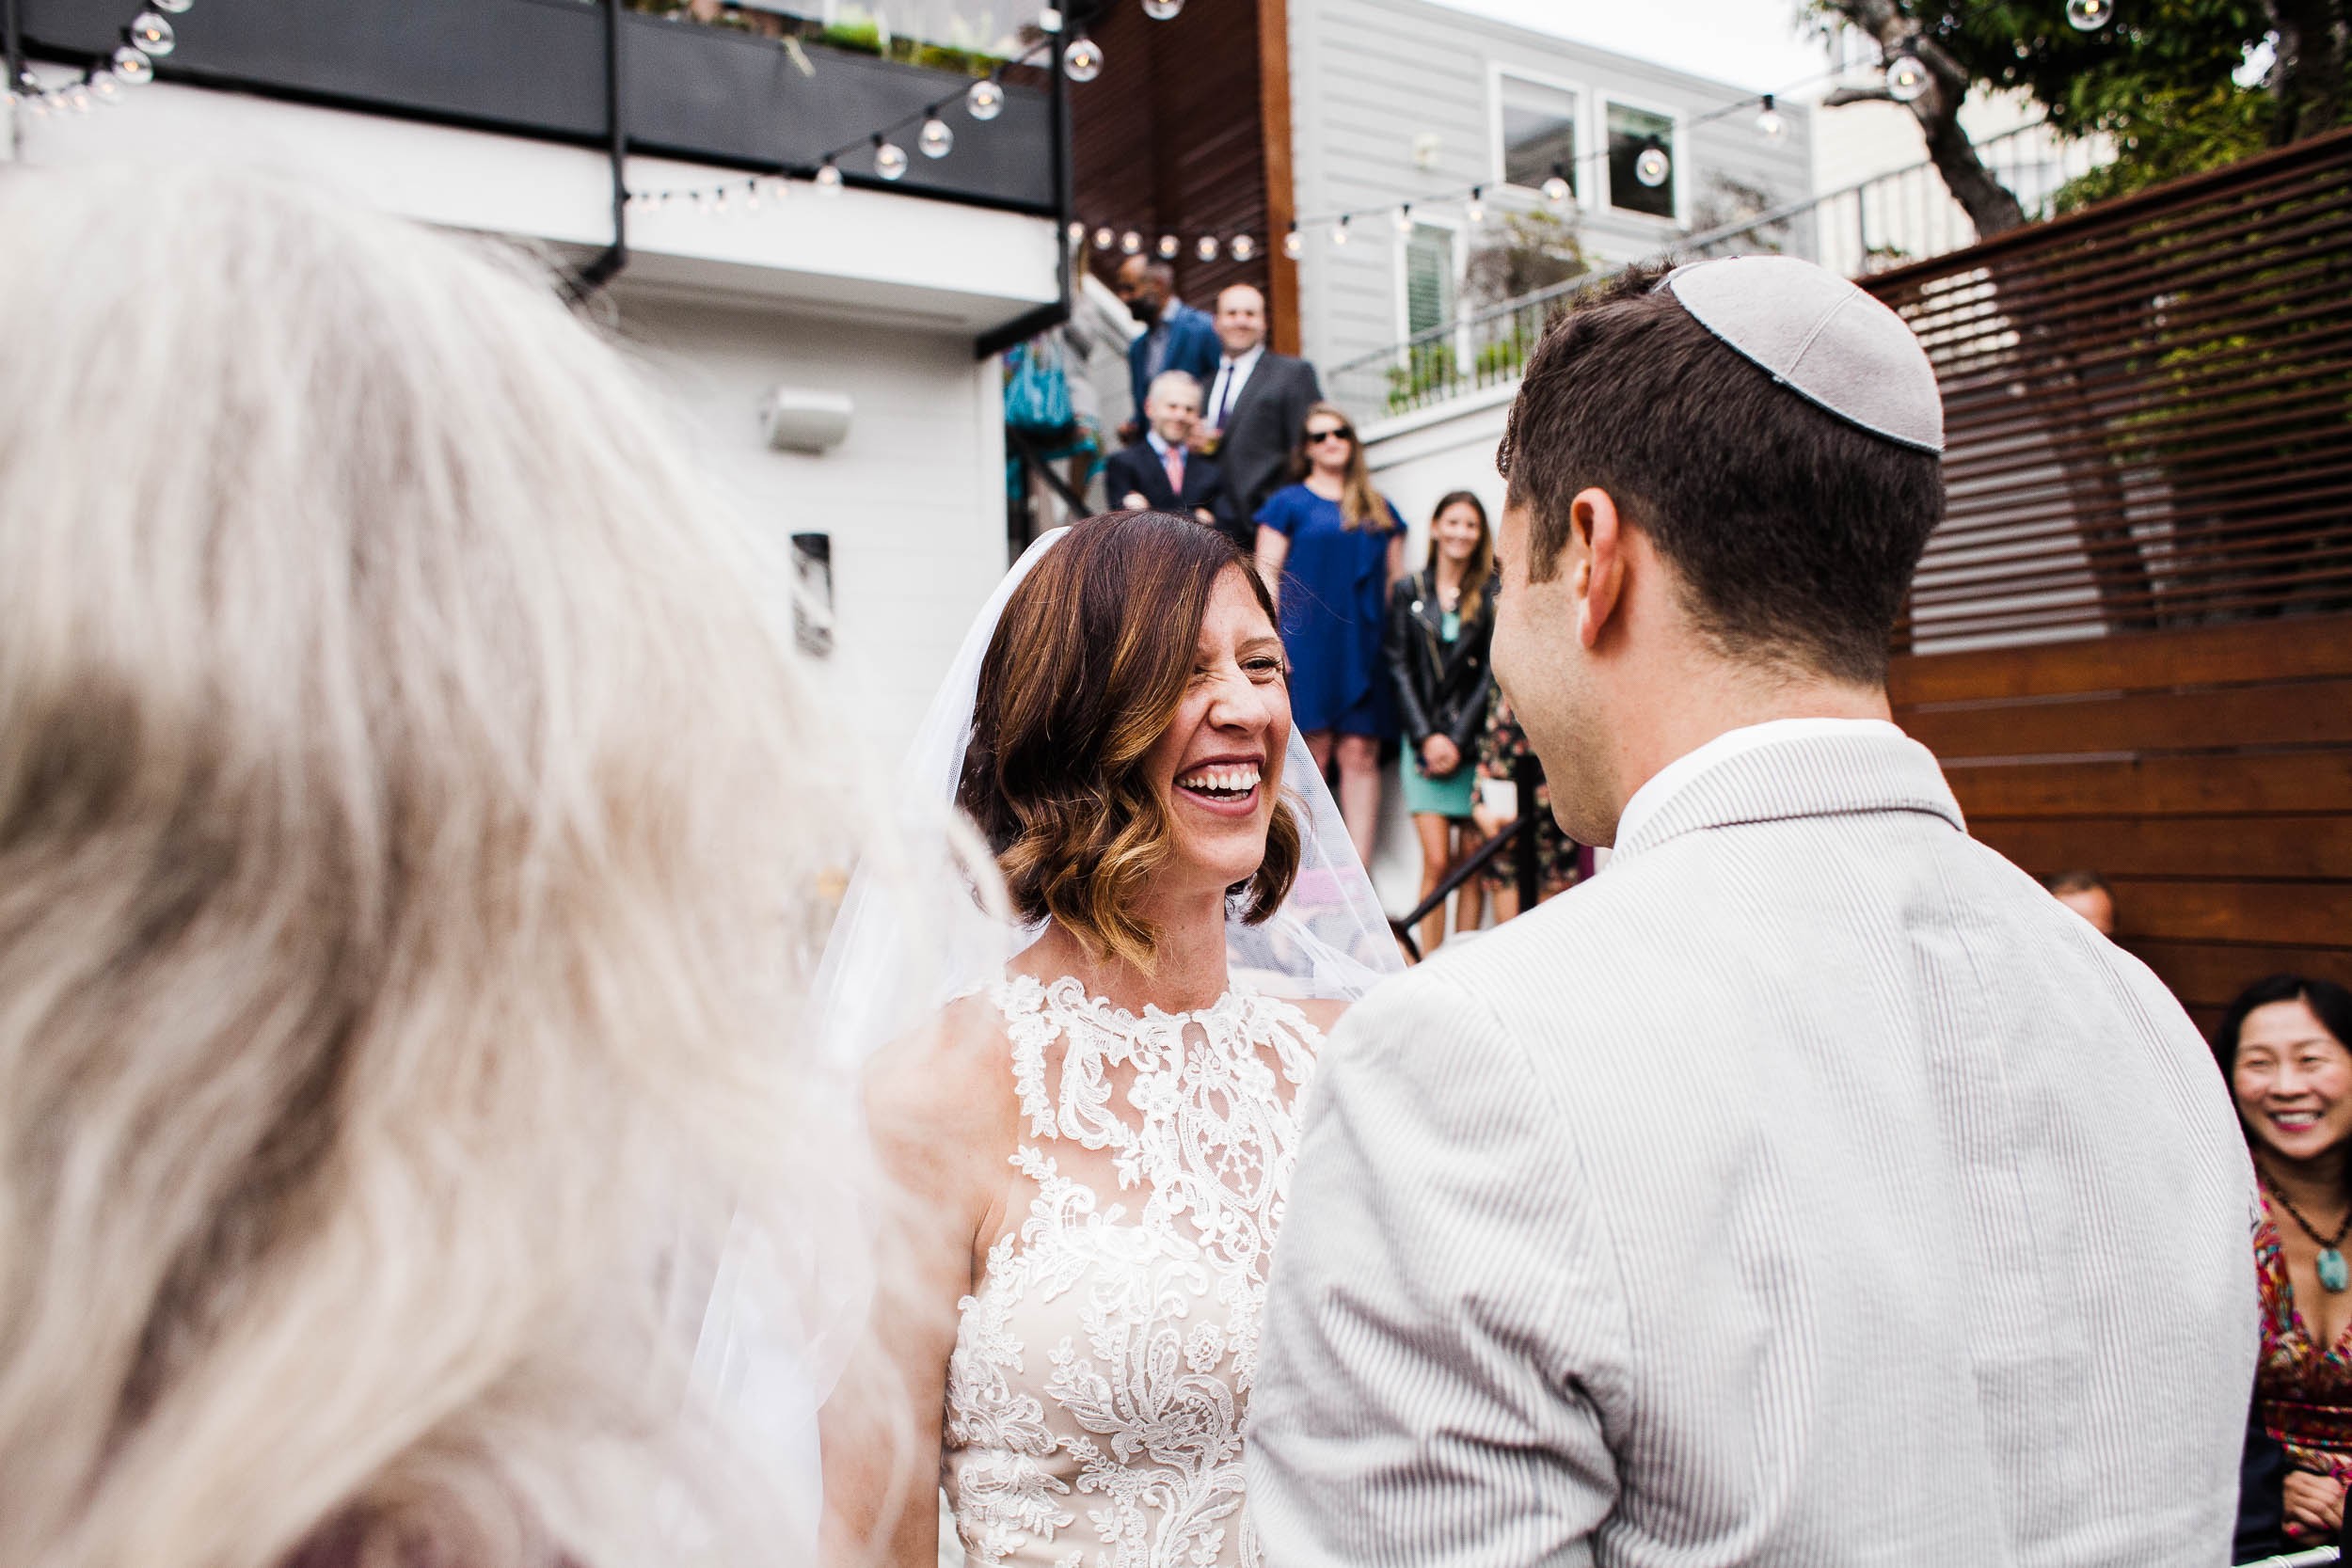 081818_Alina Jason San Francisco Wedding_Buena Lane Photography_1097 copy.jpg